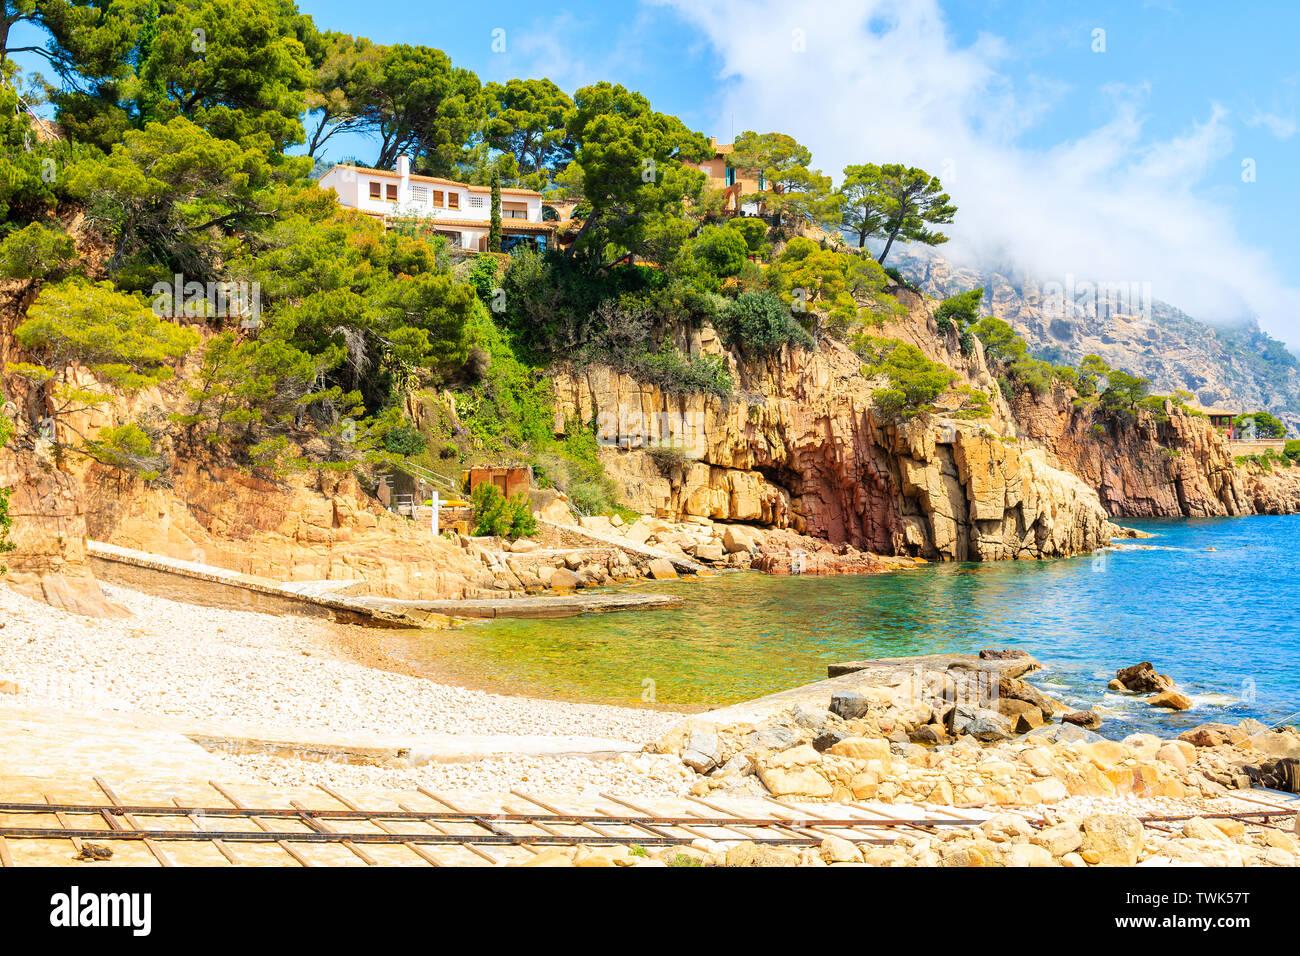 Beach view in picturesque bay near Fornells village, Costa Brava, Spain Stock Photo